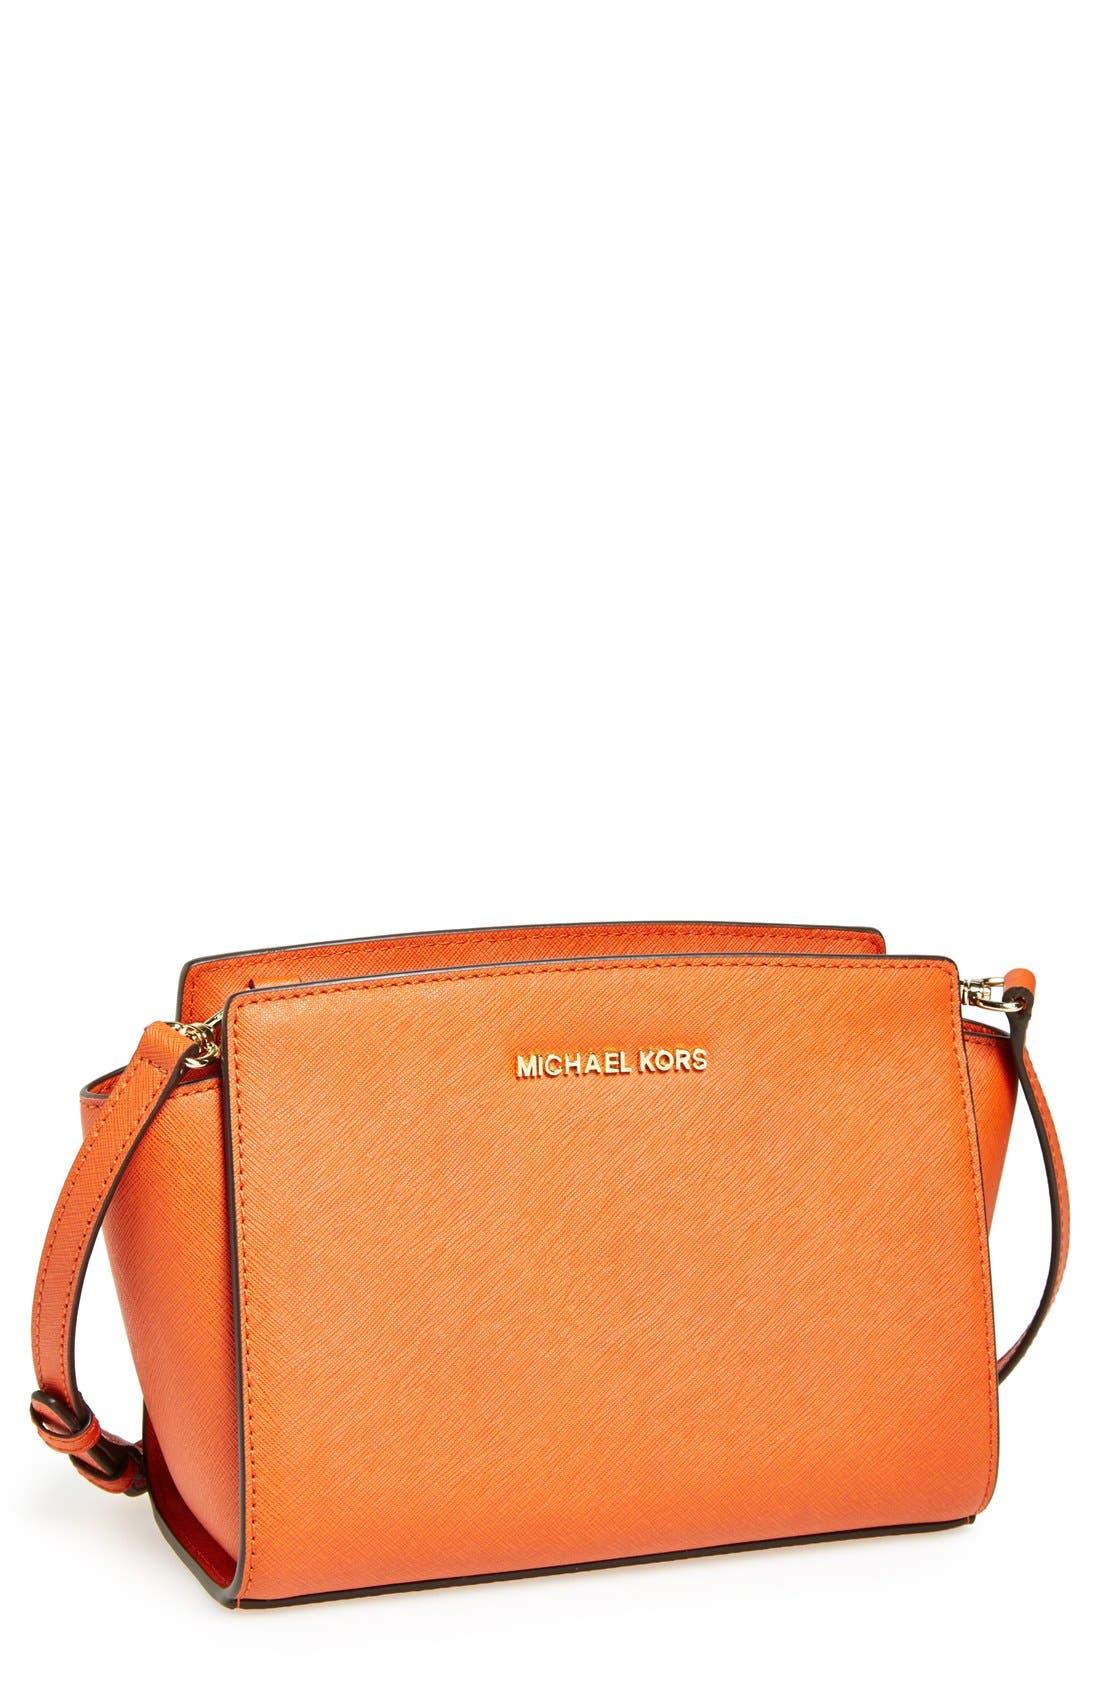 Alternate Image 1 Selected - MICHAEL Michael Kors 'Medium Selma' Saffiano Leather Crossbody Bag